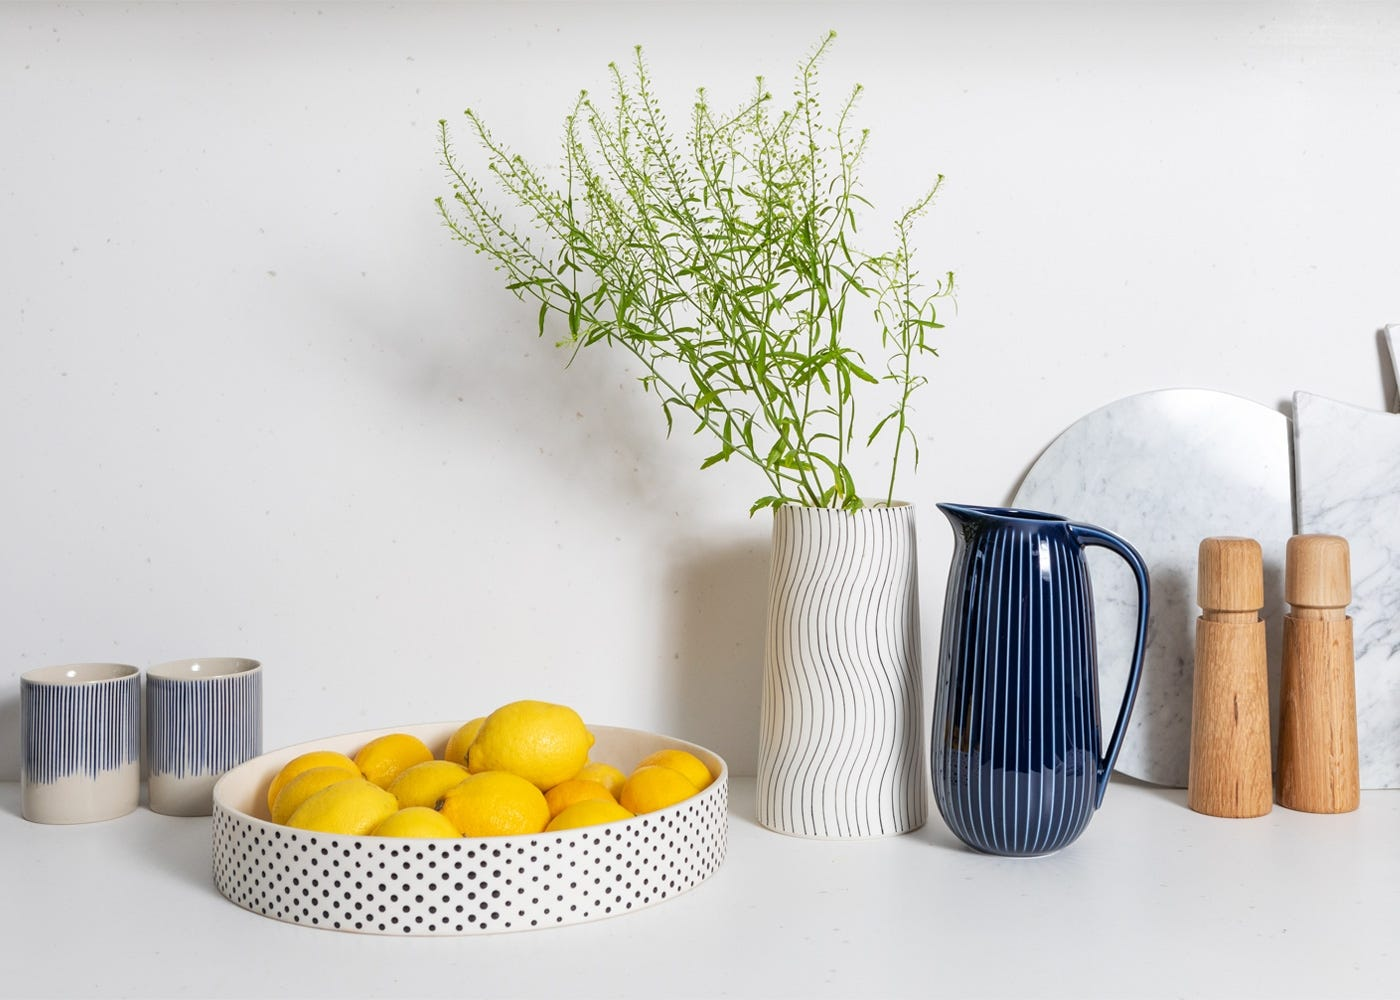 Karuma mugs with the Myer Halliday fruit bowl and Hammershoi jug